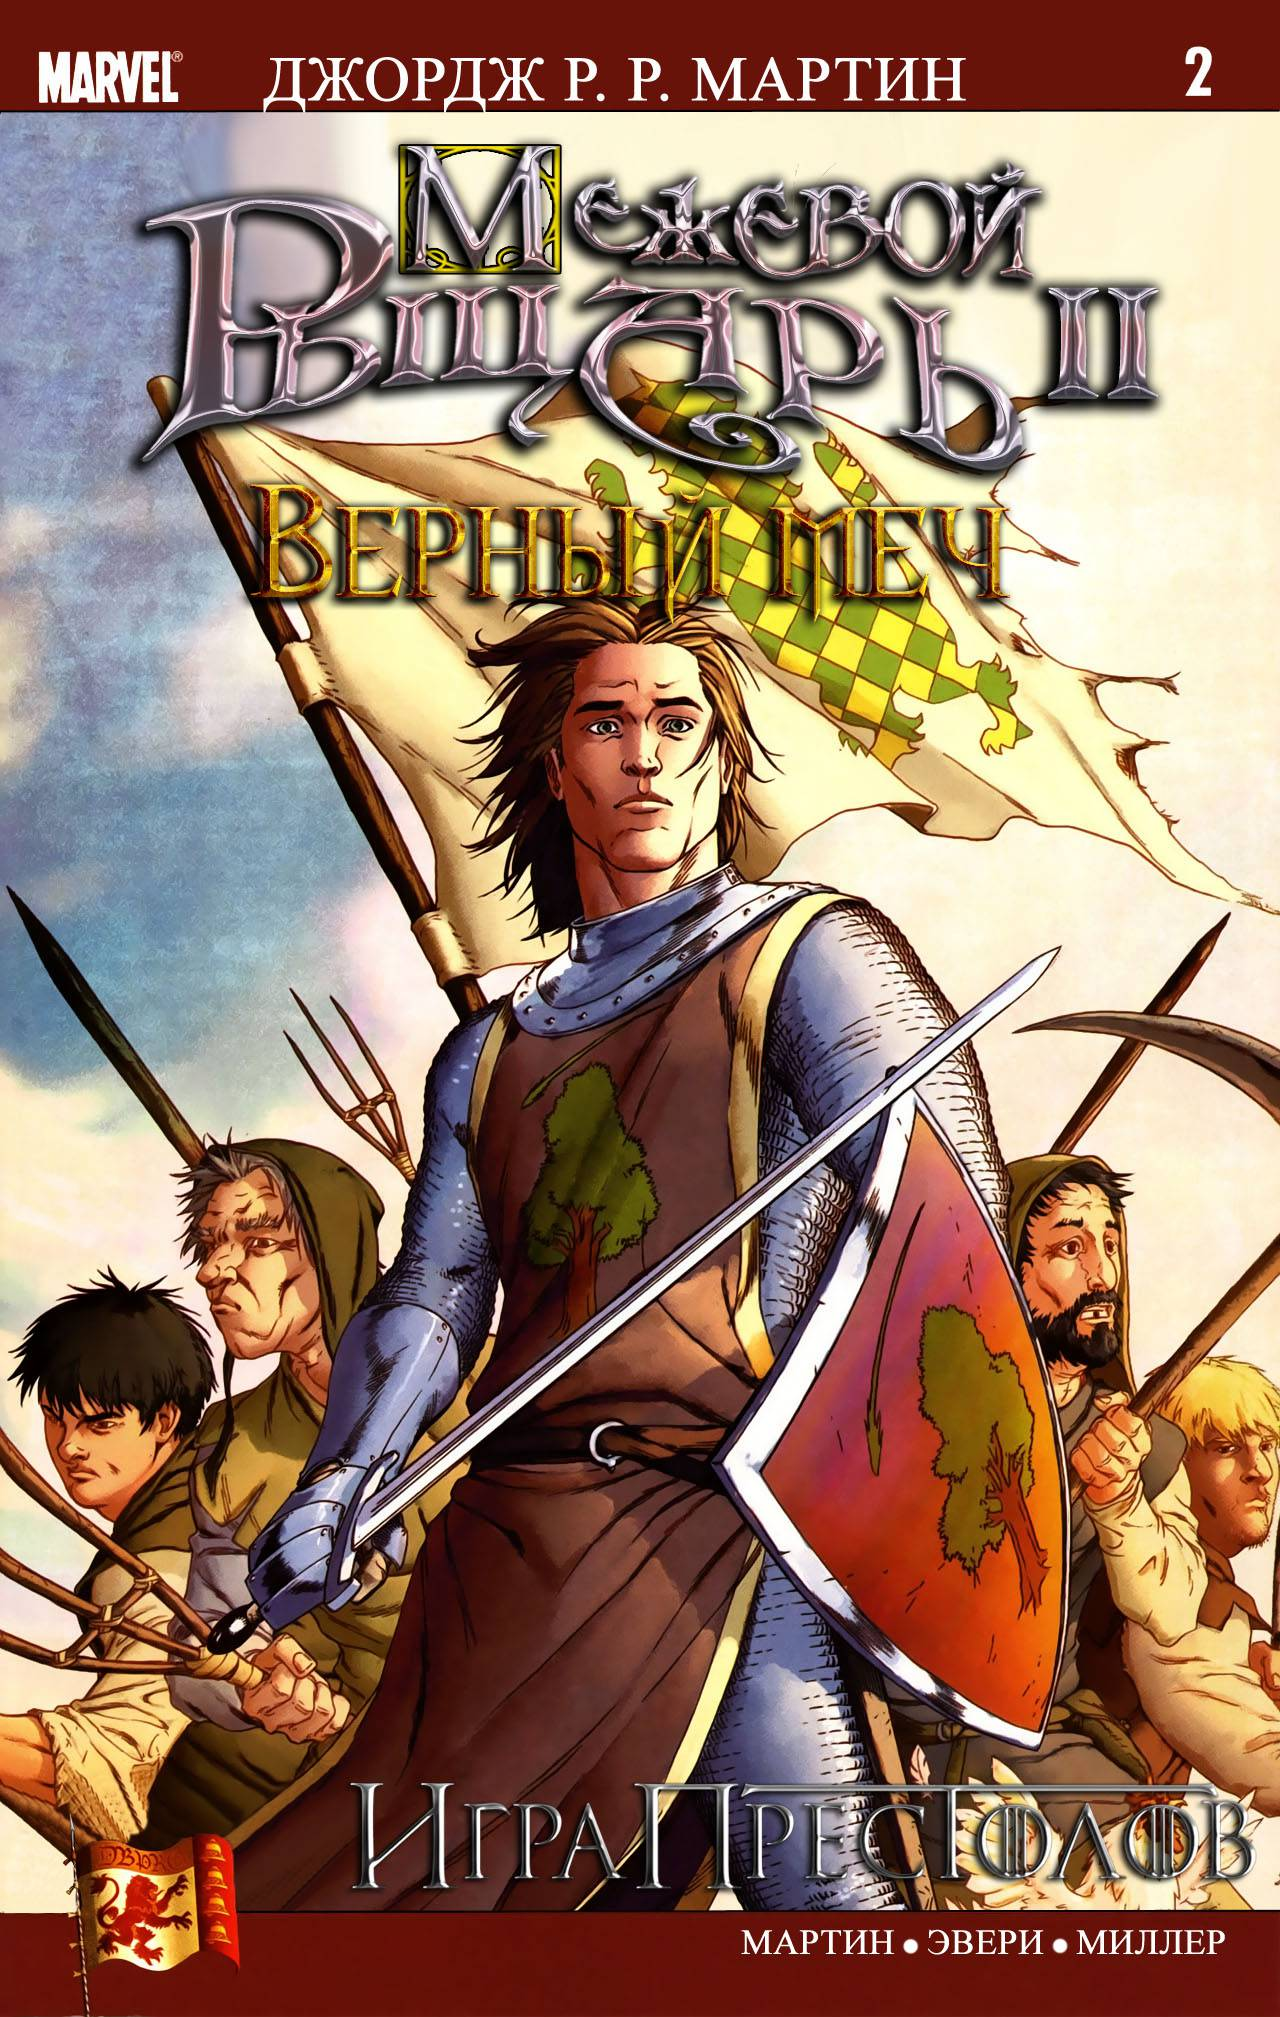 Межевой Рыцарь II: Верный Меч №2 онлайн